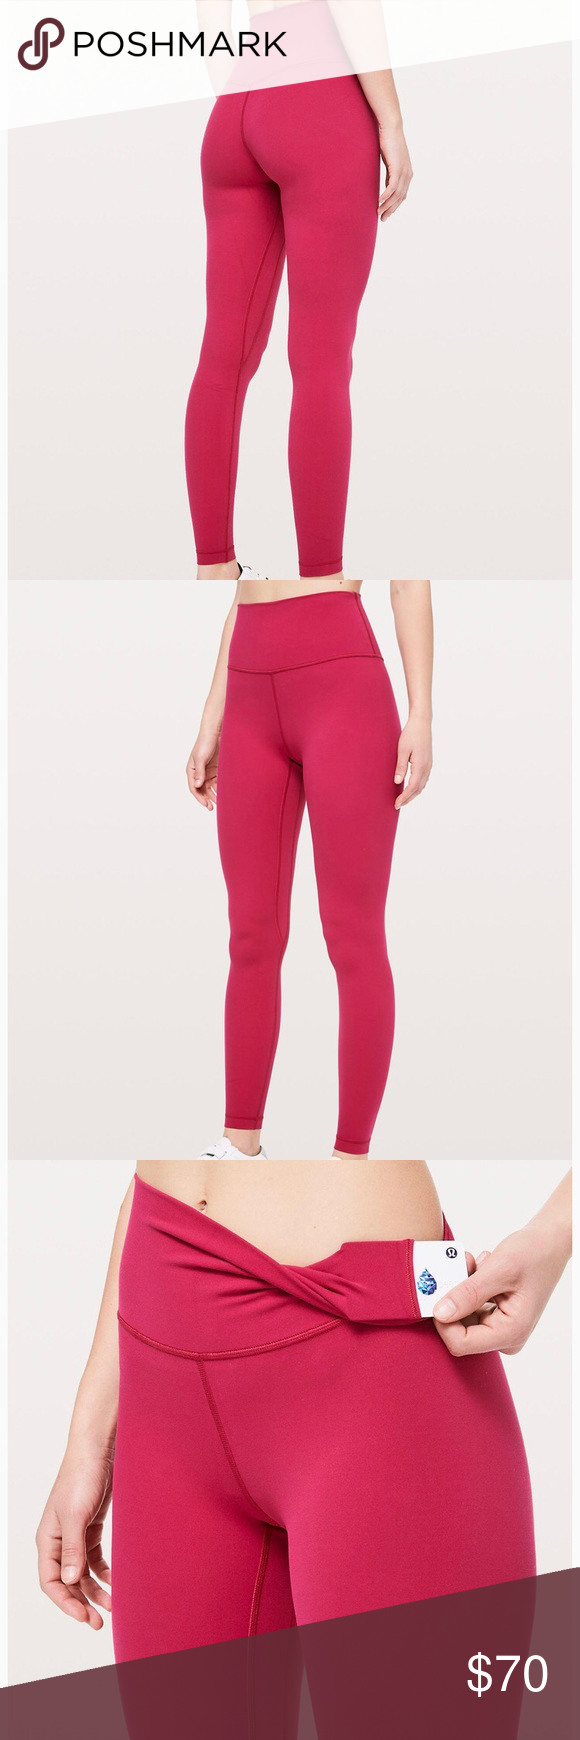 Super Soft Women/'s Red Leggings//Yoga Pants With Flowers Sz M